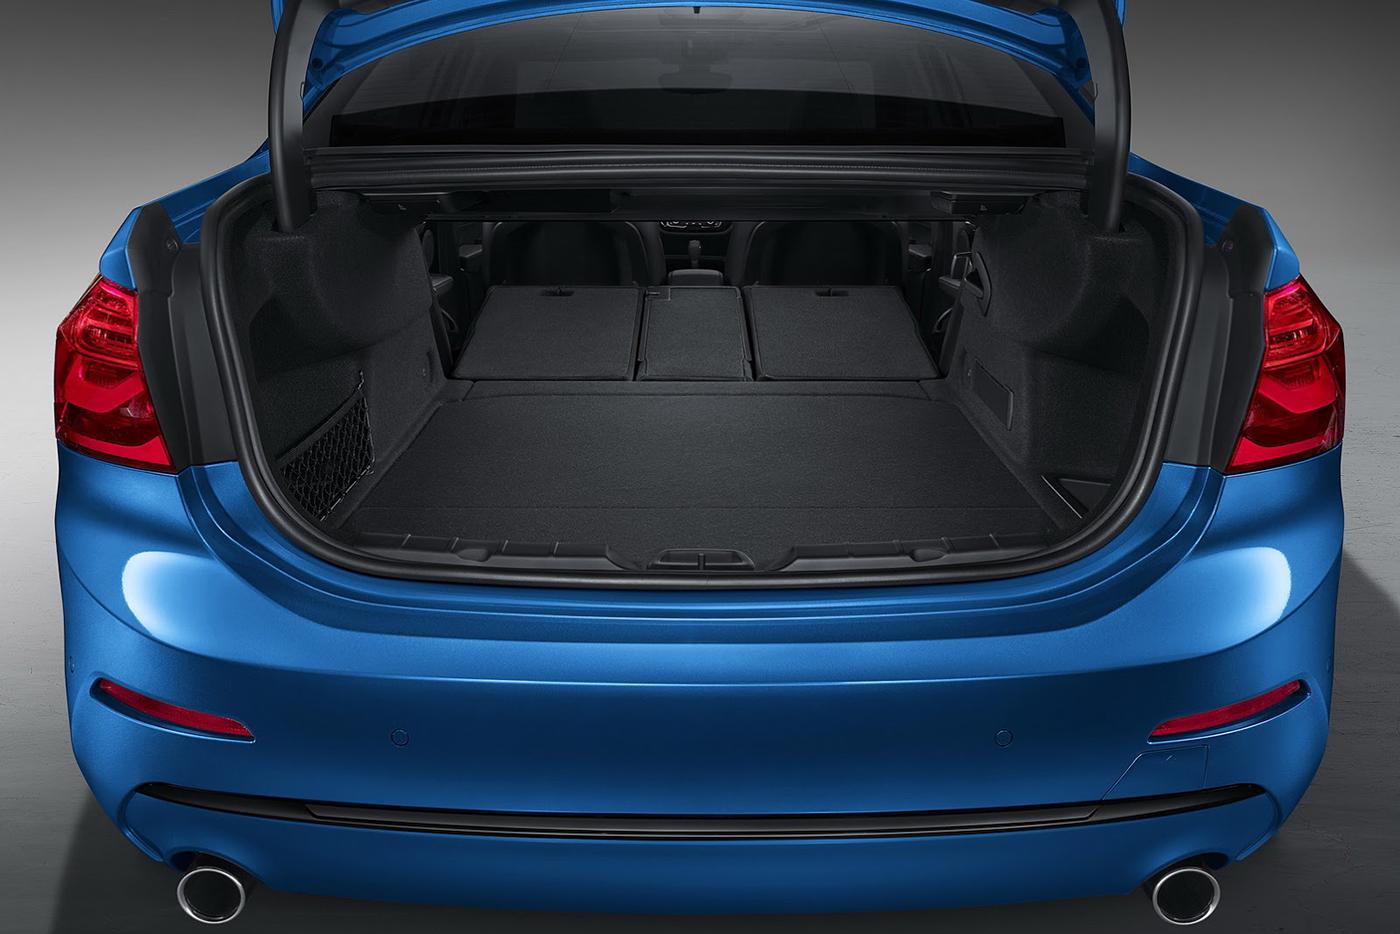 bmw-1-series-sedan-7.jpg